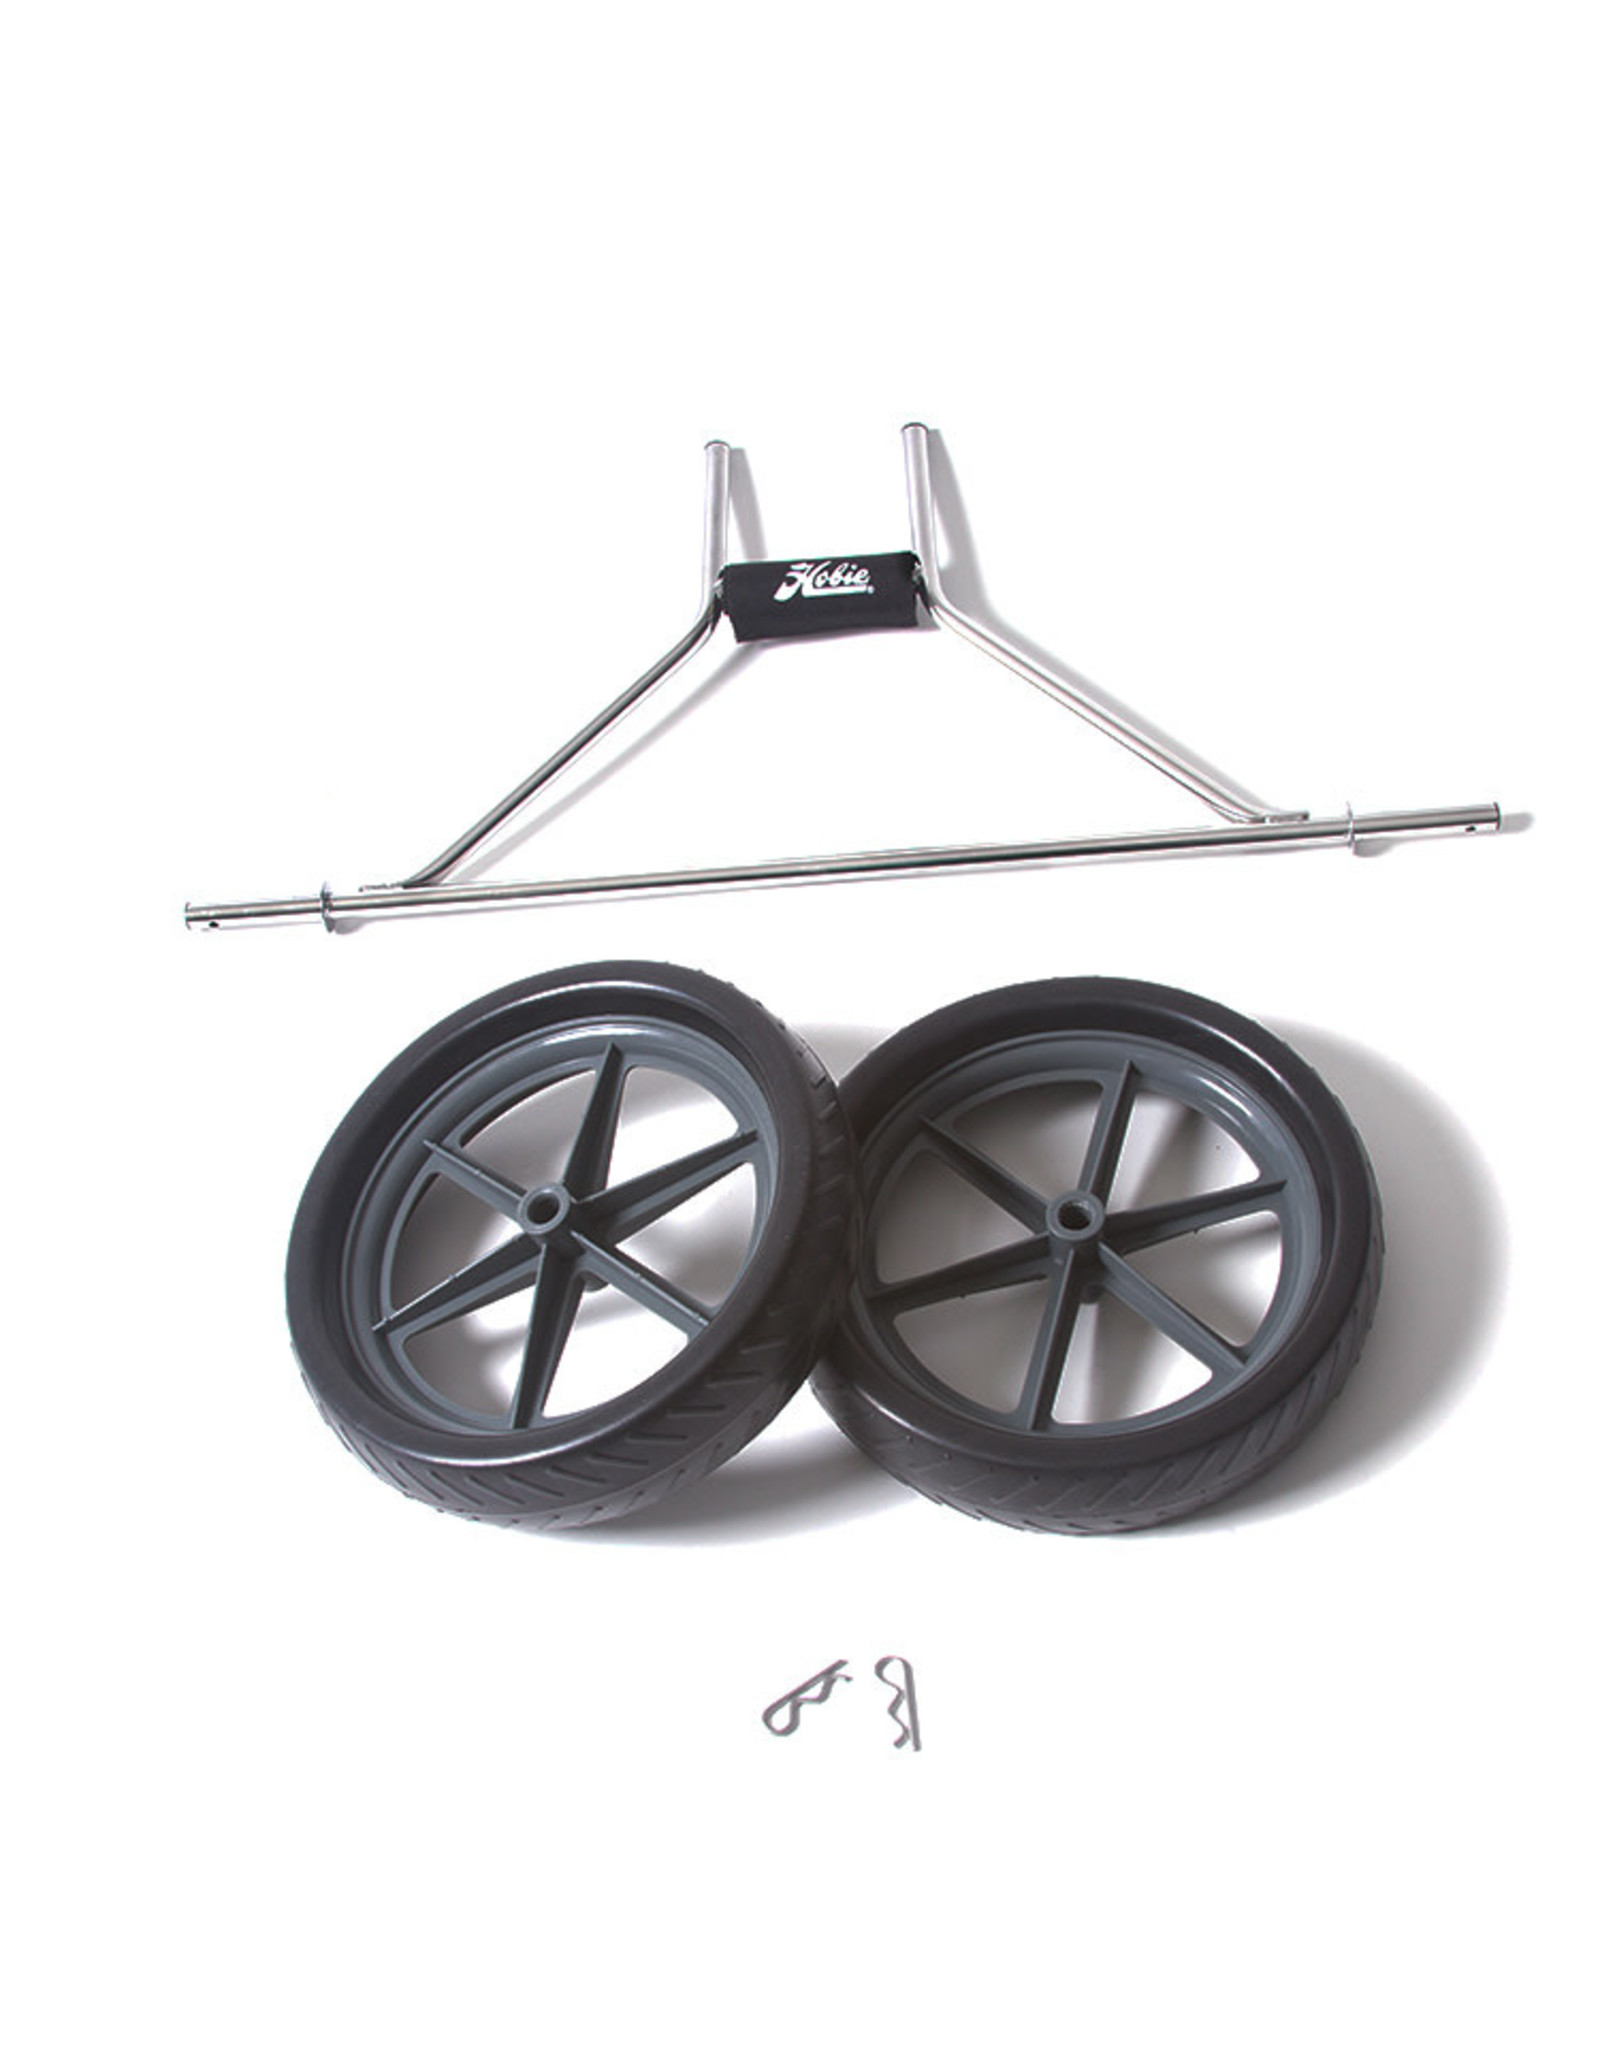 Hobie Hobie Acc. Chariot Plug-in-Cart pour I-Serie / Eclipse